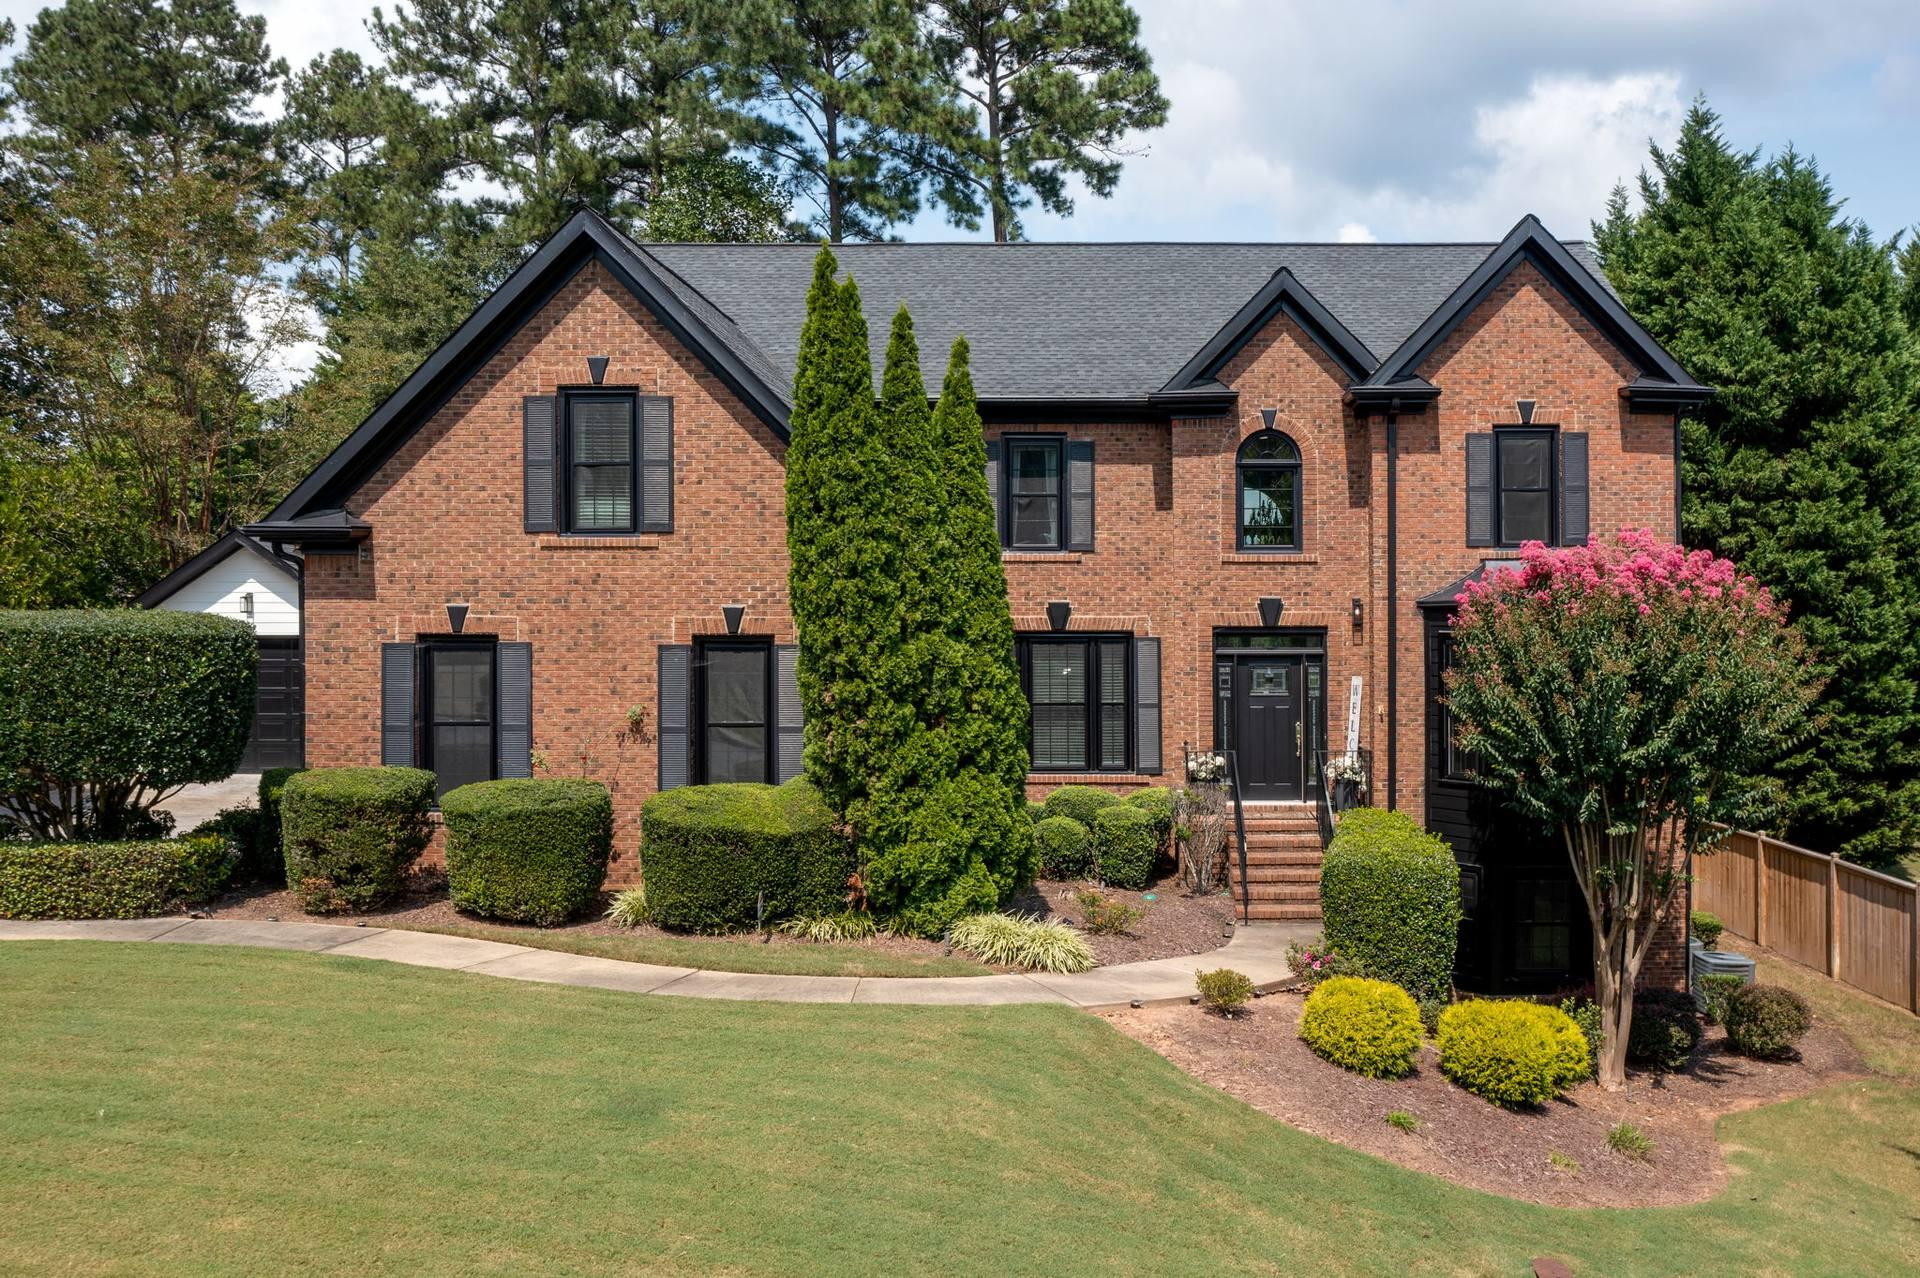 217 White Oak Dr, Canton, GA 30114, USA